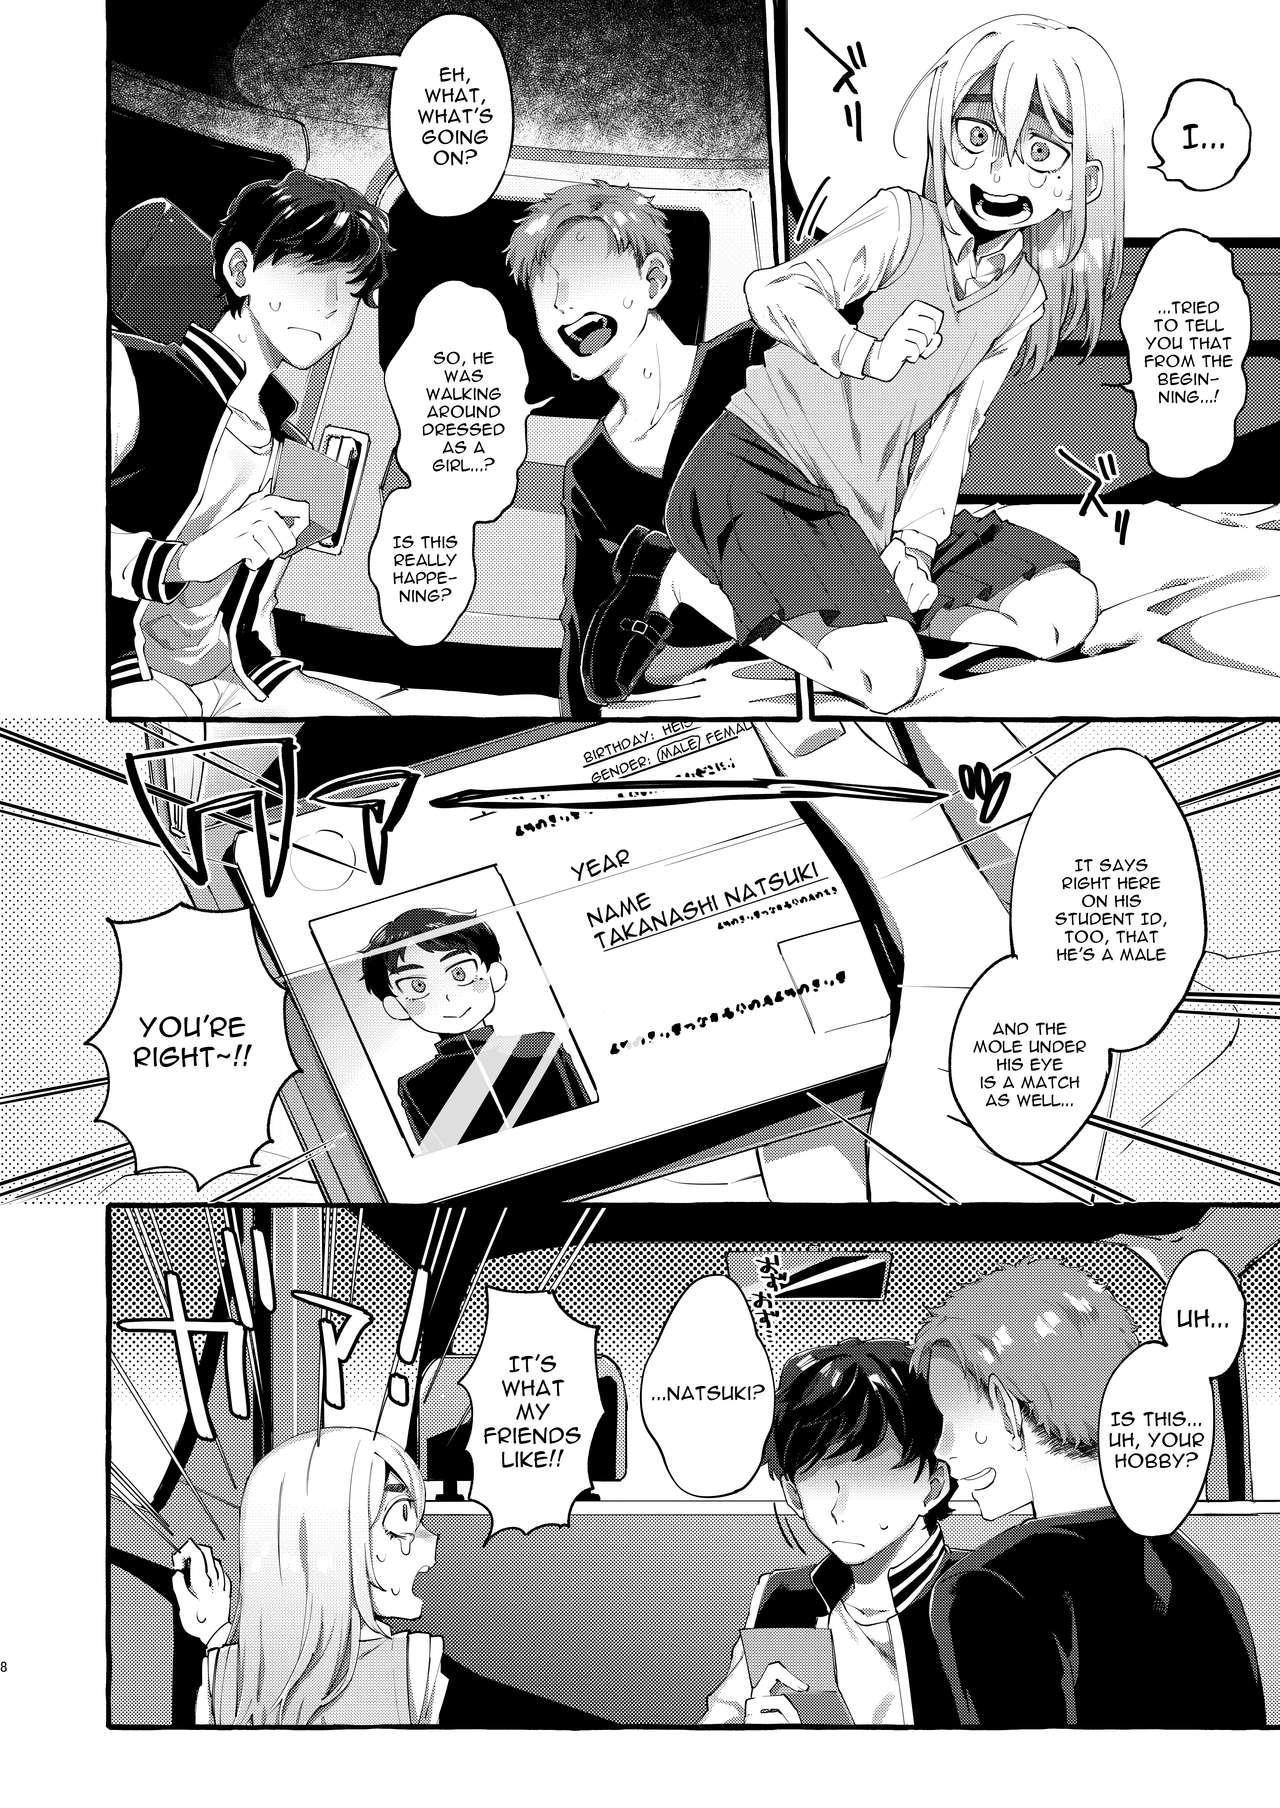 Joshigakusei o Rachi Yuukai Shita to Omottara Otokonoko datta.  We Thought We Kidnapped and Drove Away with a Girl Student, but It Turned out to be a Girly Boy. 6